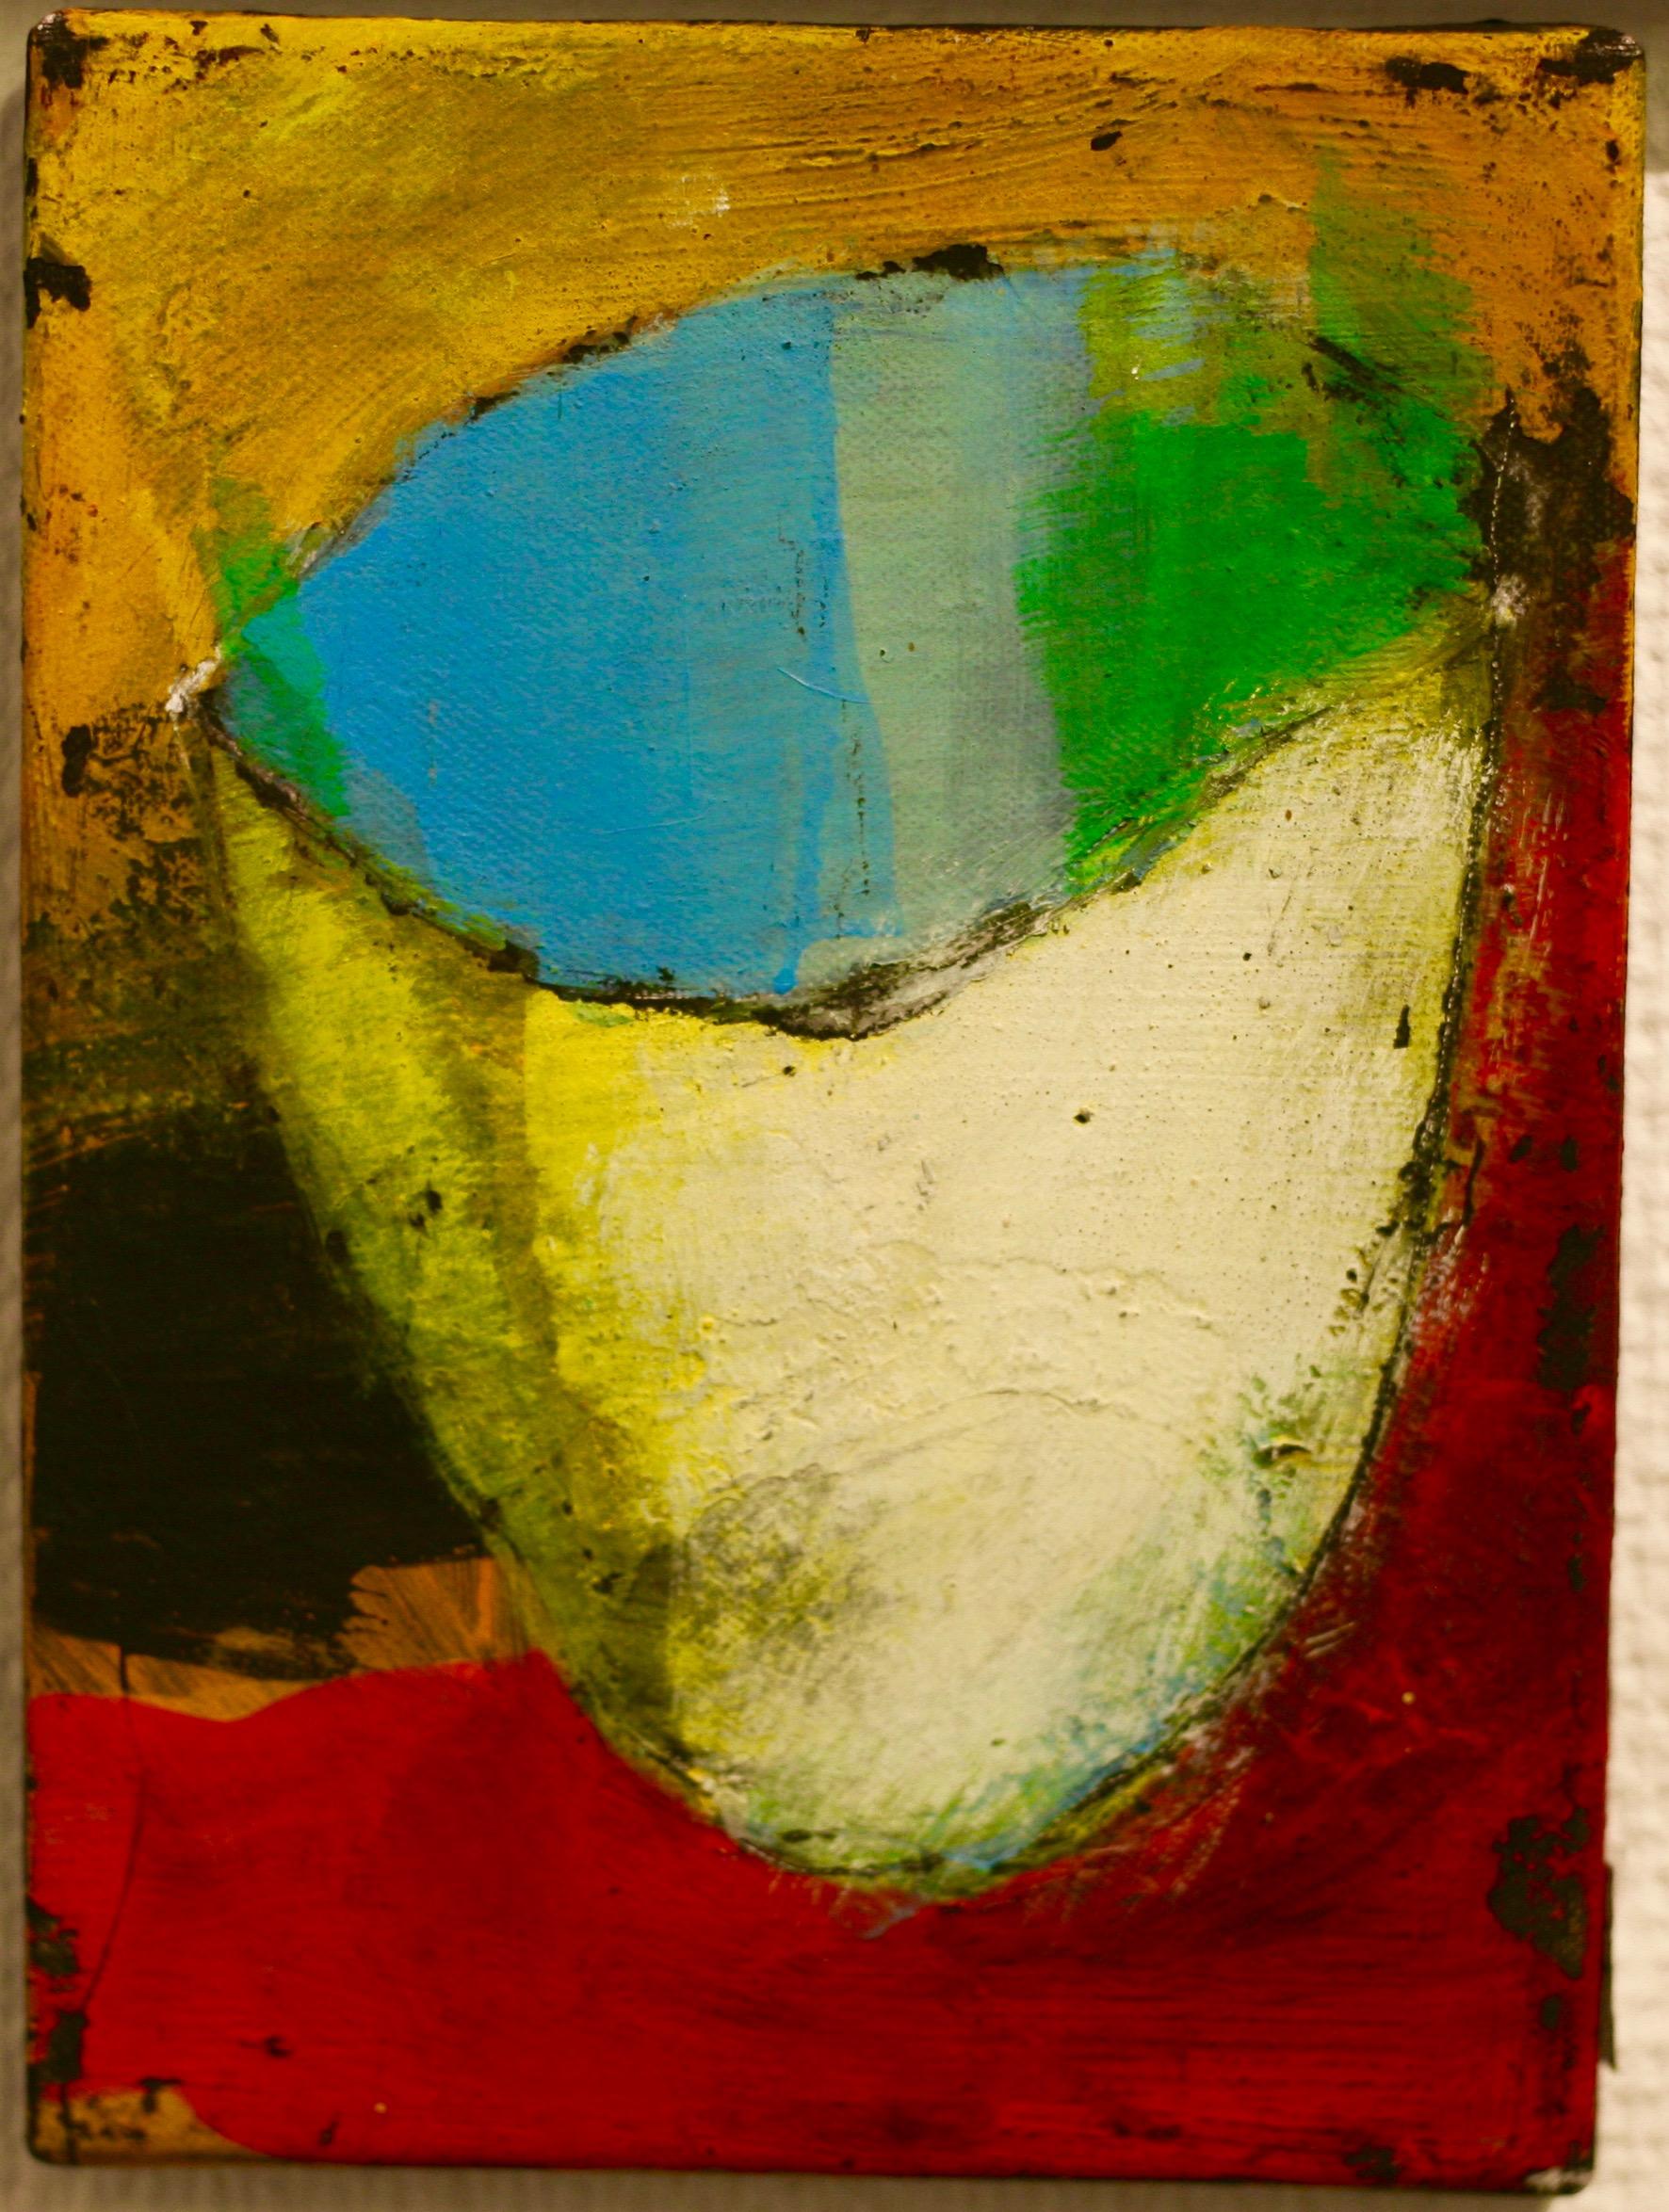 Inga Björstedt - Rice bowl (Risskål), oil tempera painting